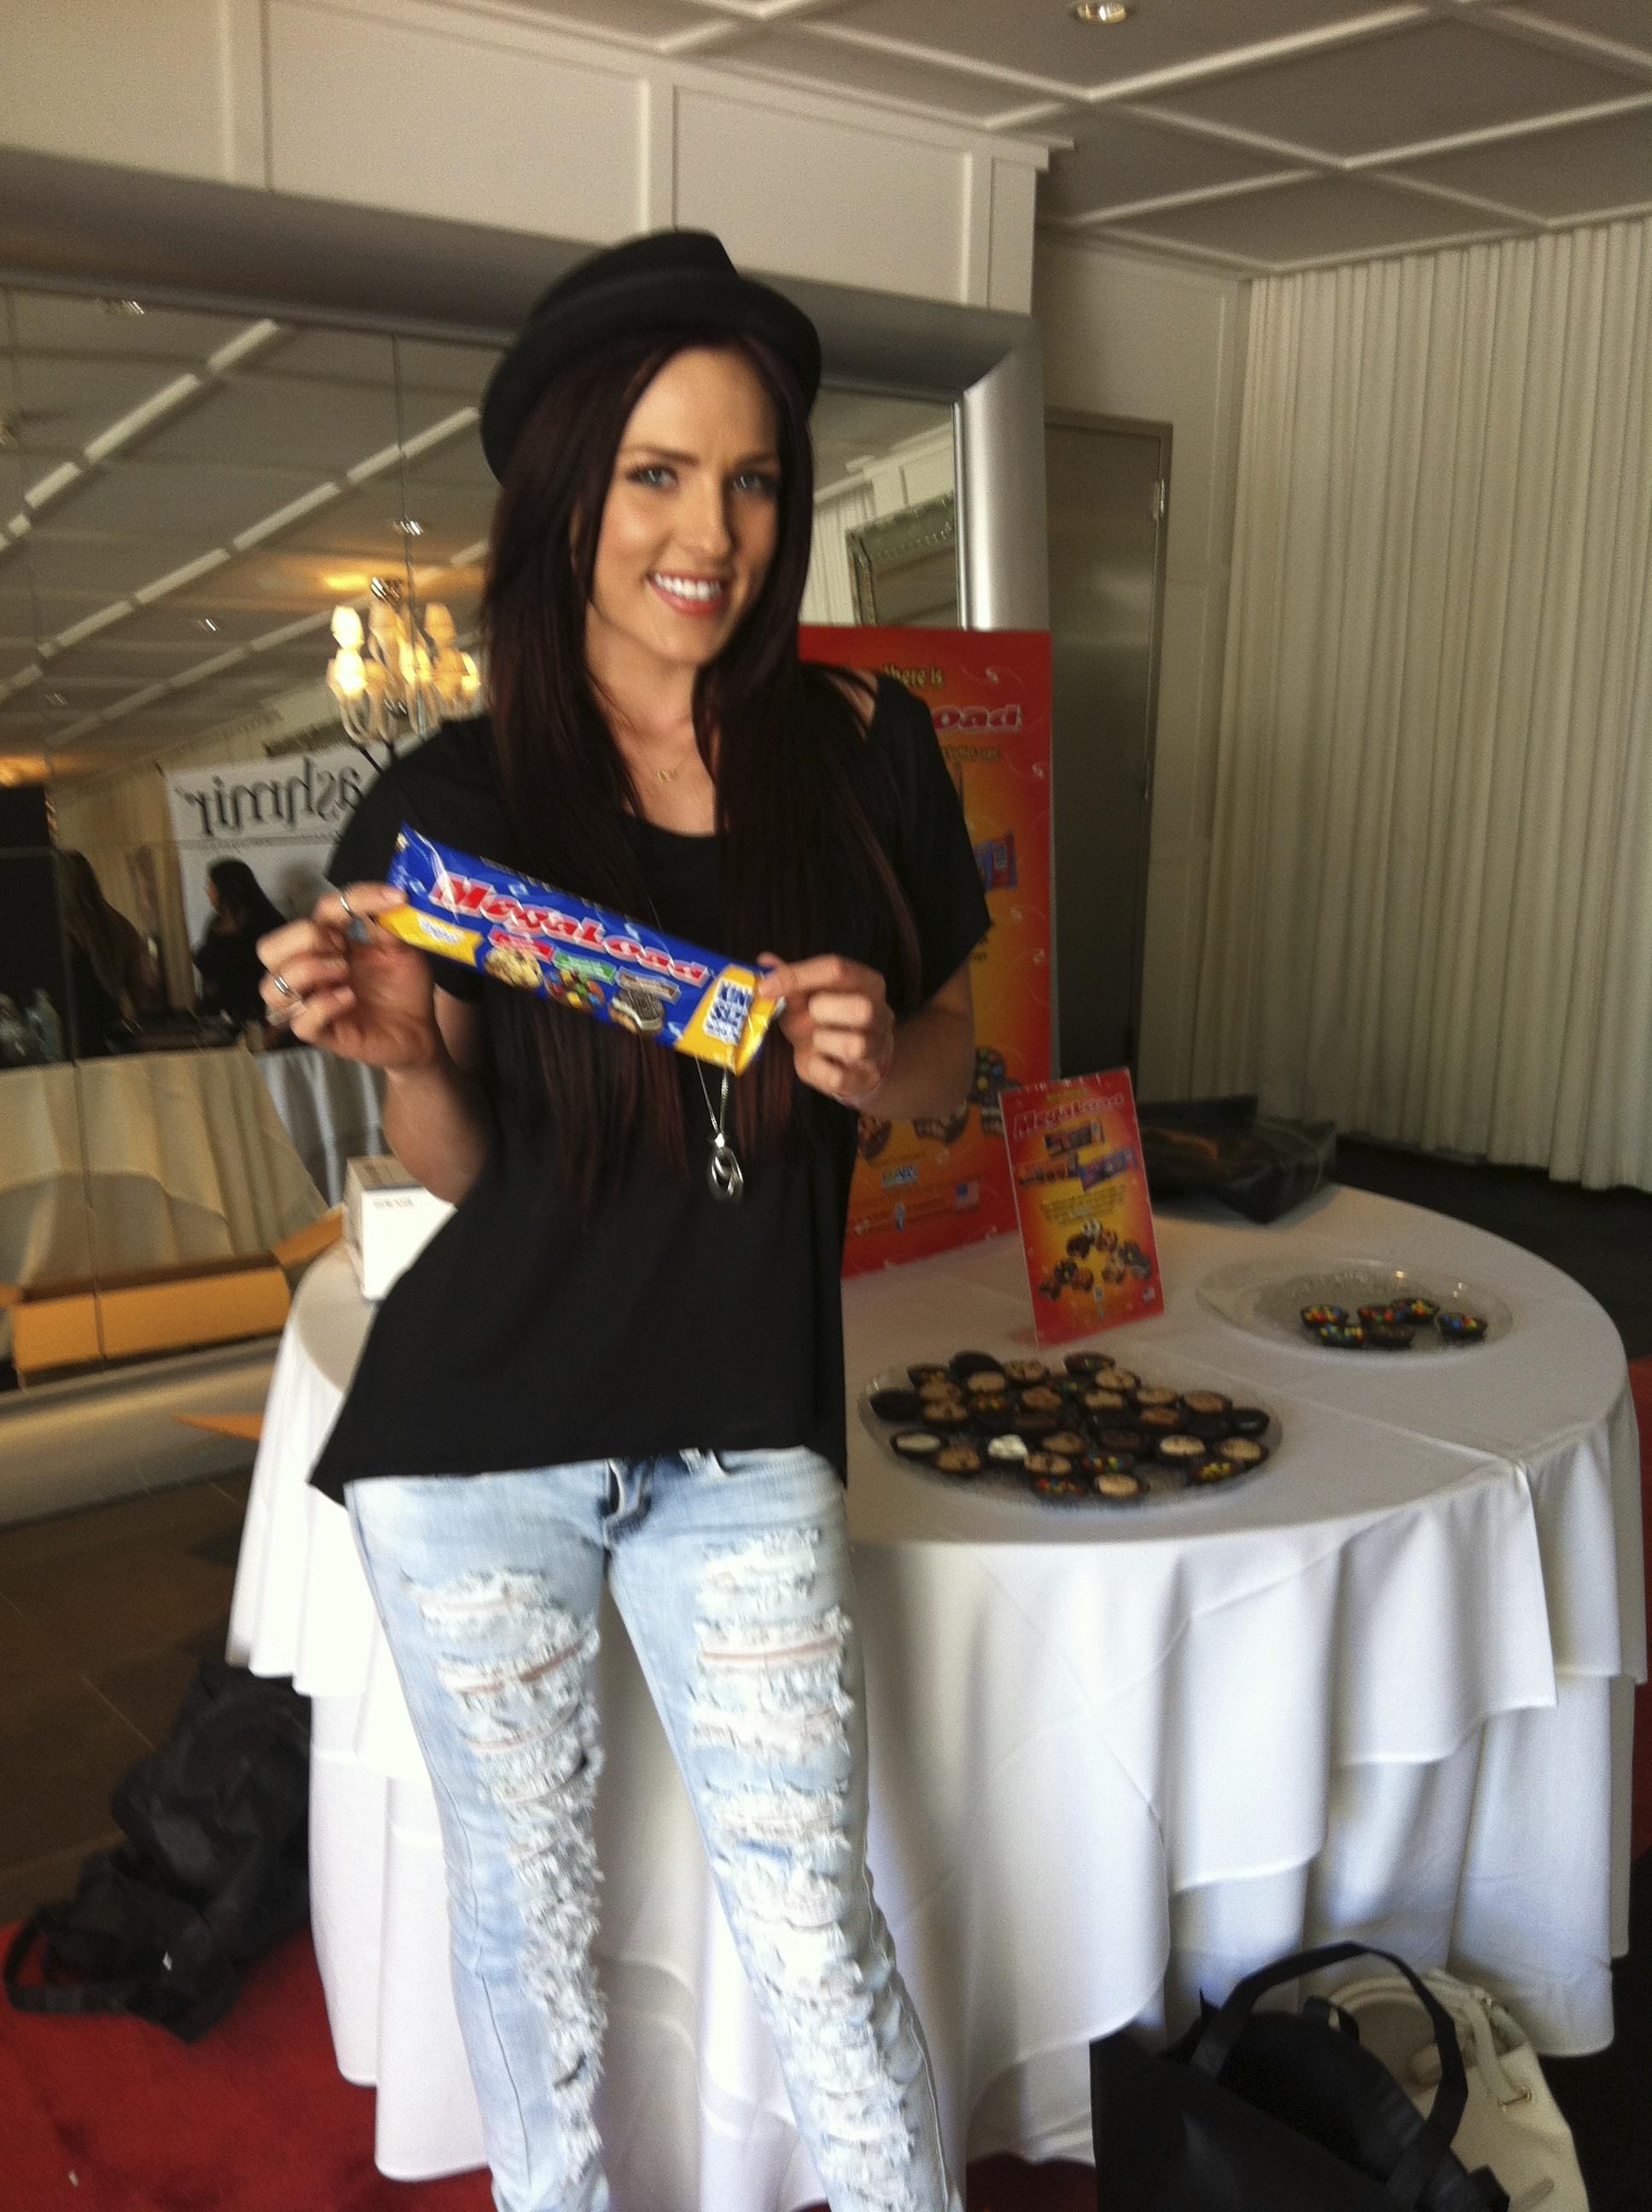 Megaload Chocolate Maker Of Delightful Chocolate Treats